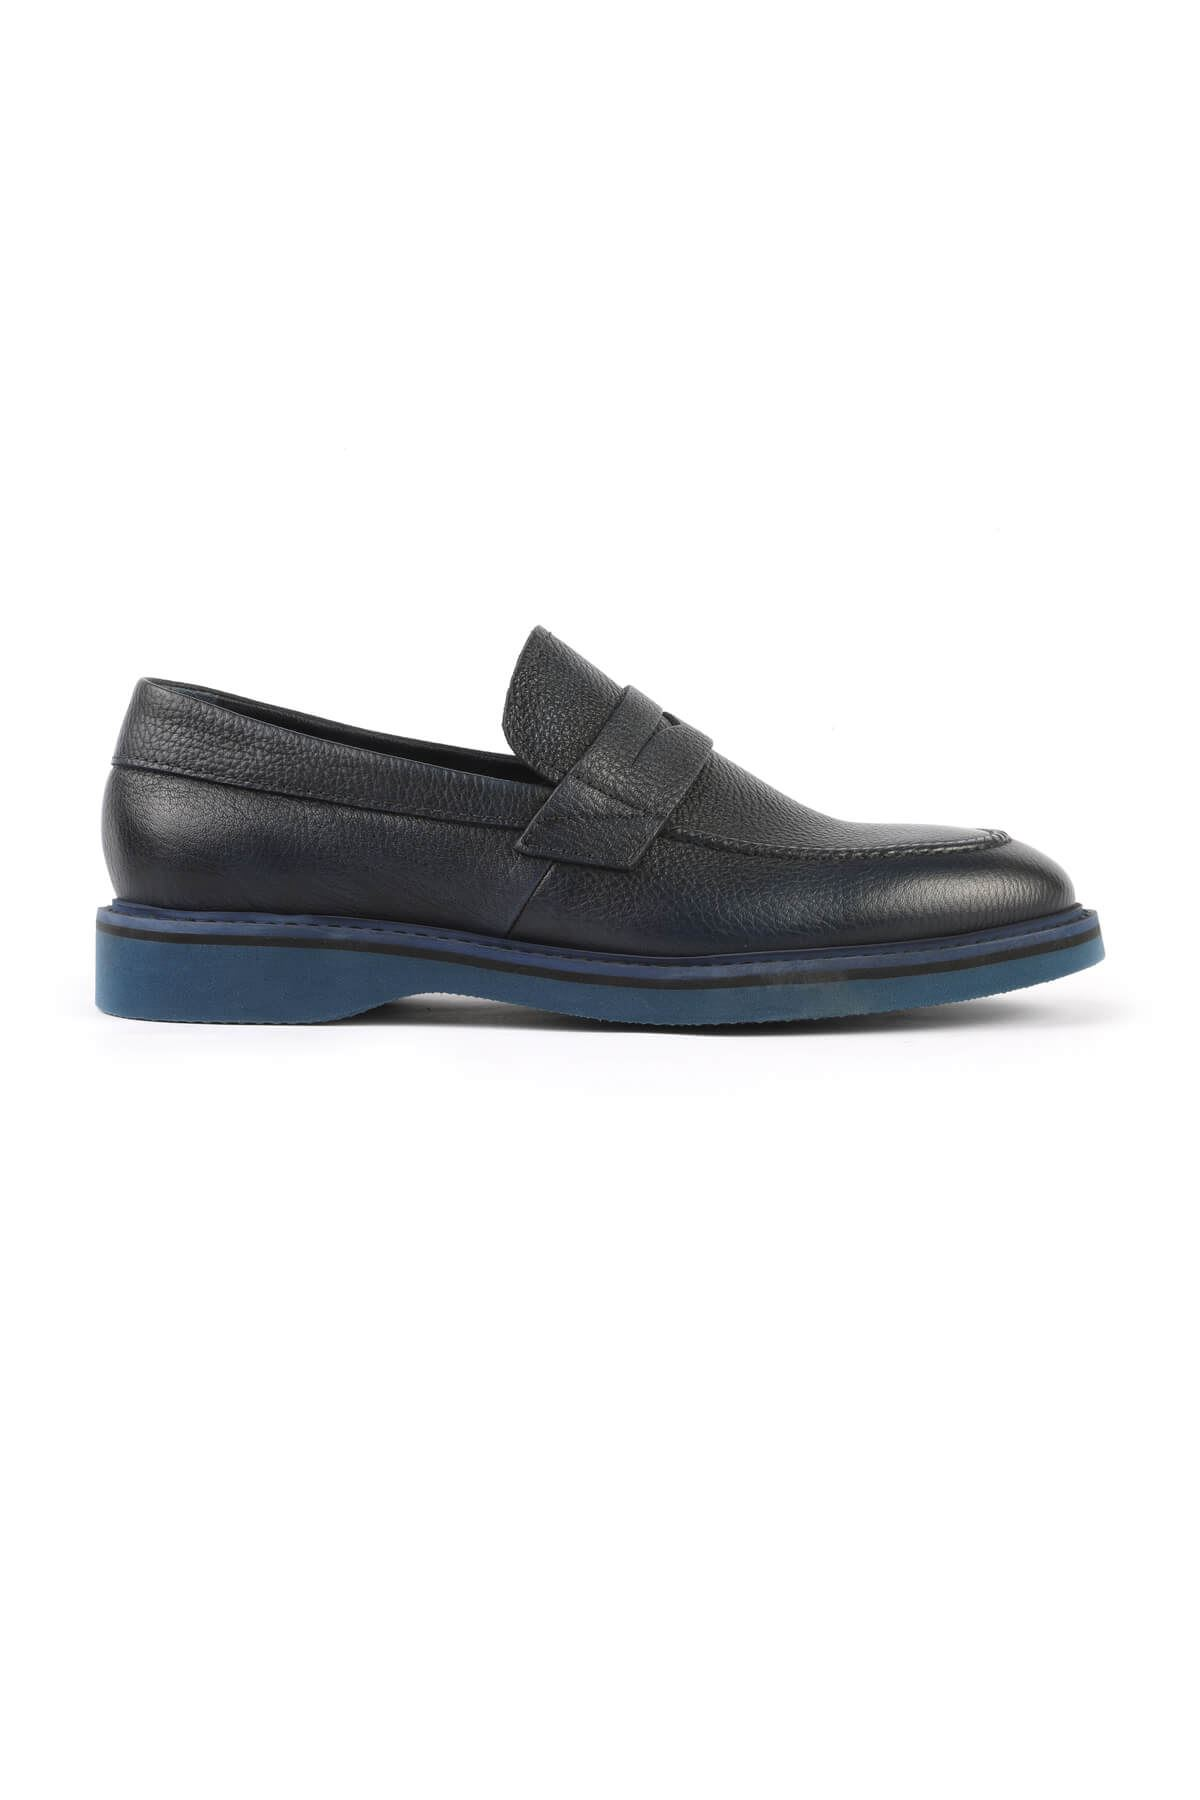 Libero 2695 Lacivert Loafer Ayakkabı